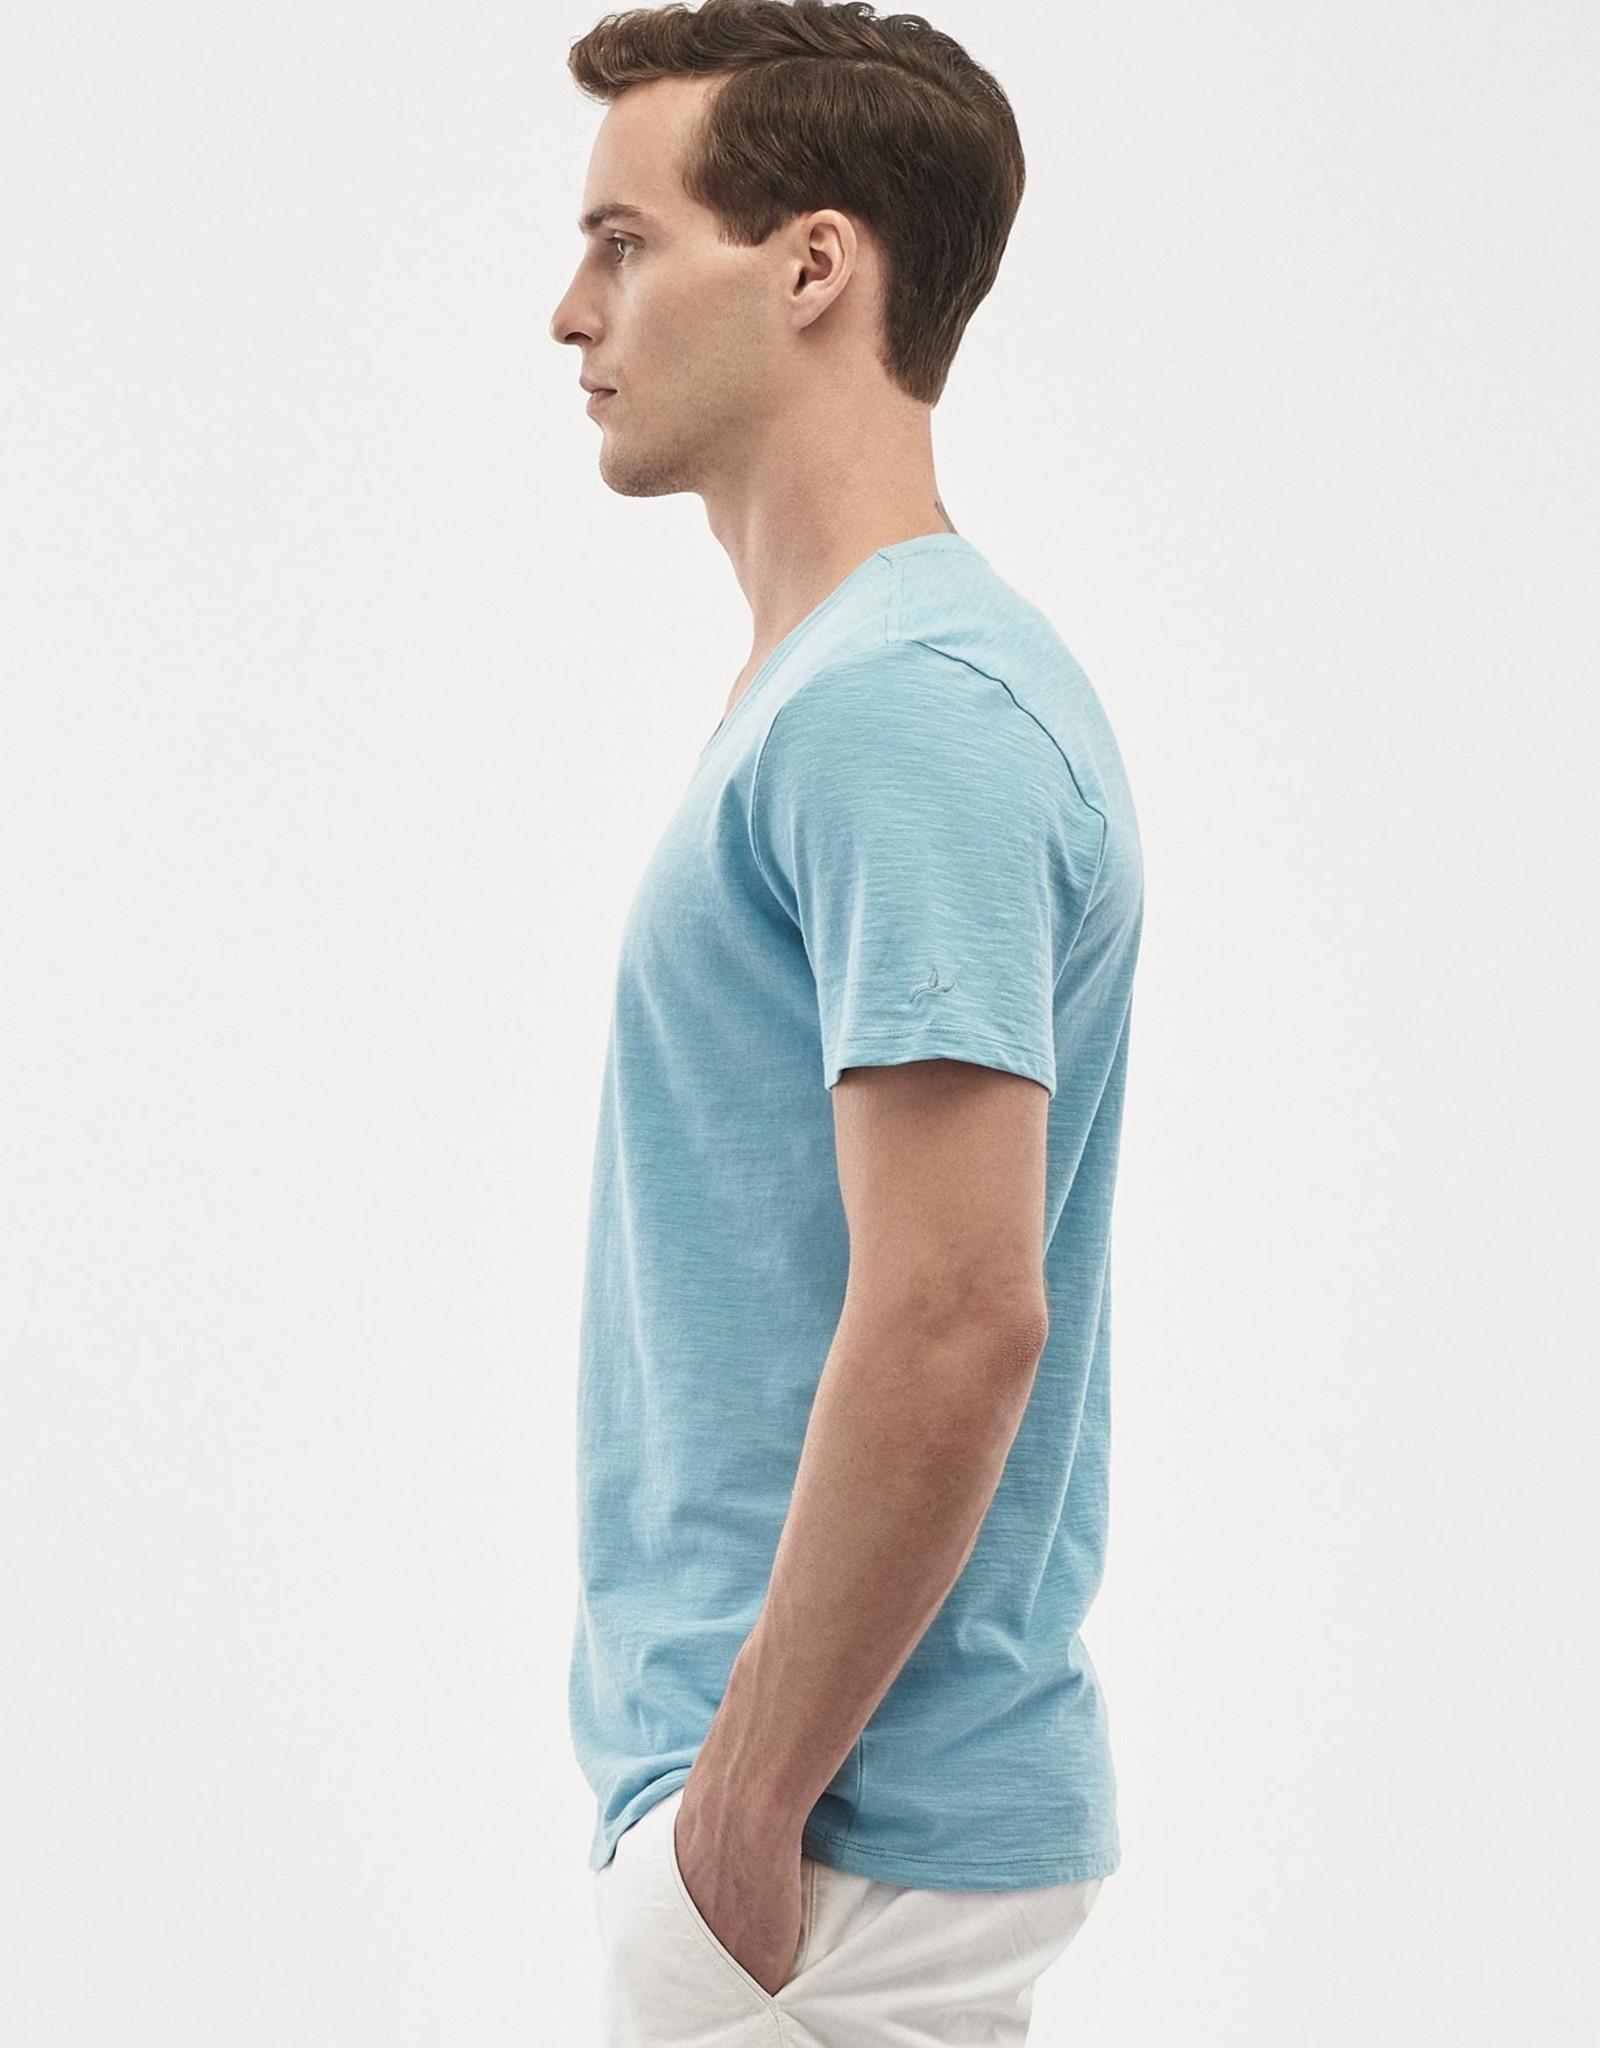 Organication T-SHIRT V-NECK BLUE